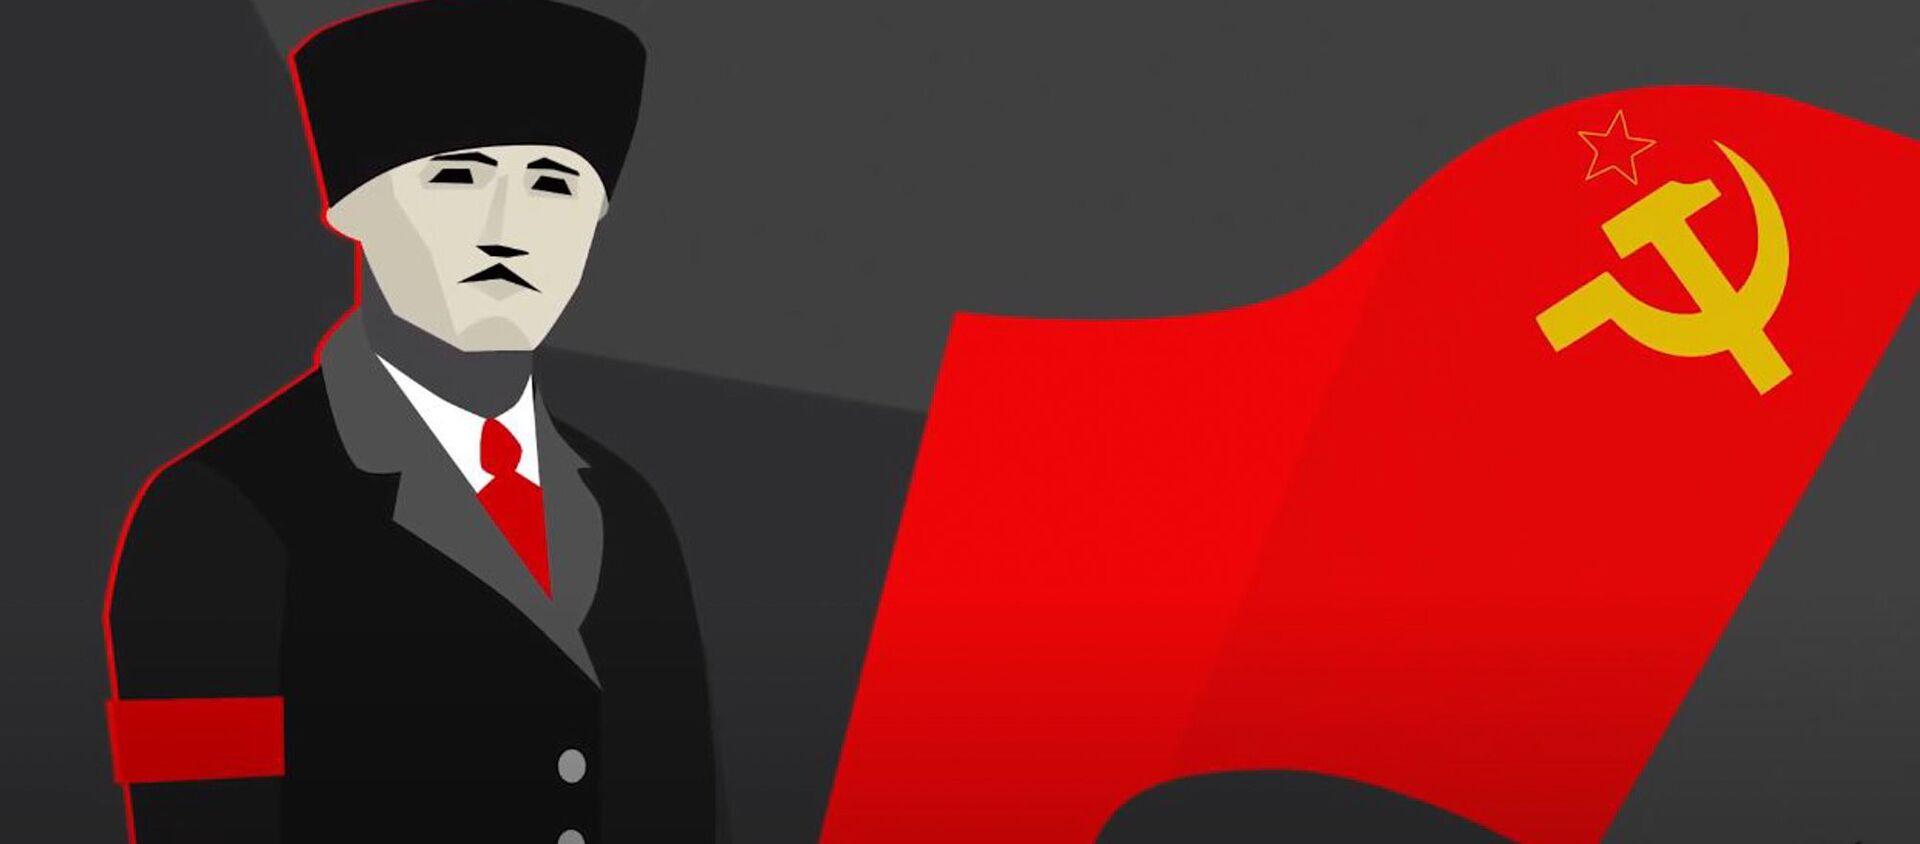 100 лет назад: революция и Абхазия - Sputnik Абхазия, 1920, 05.03.2021